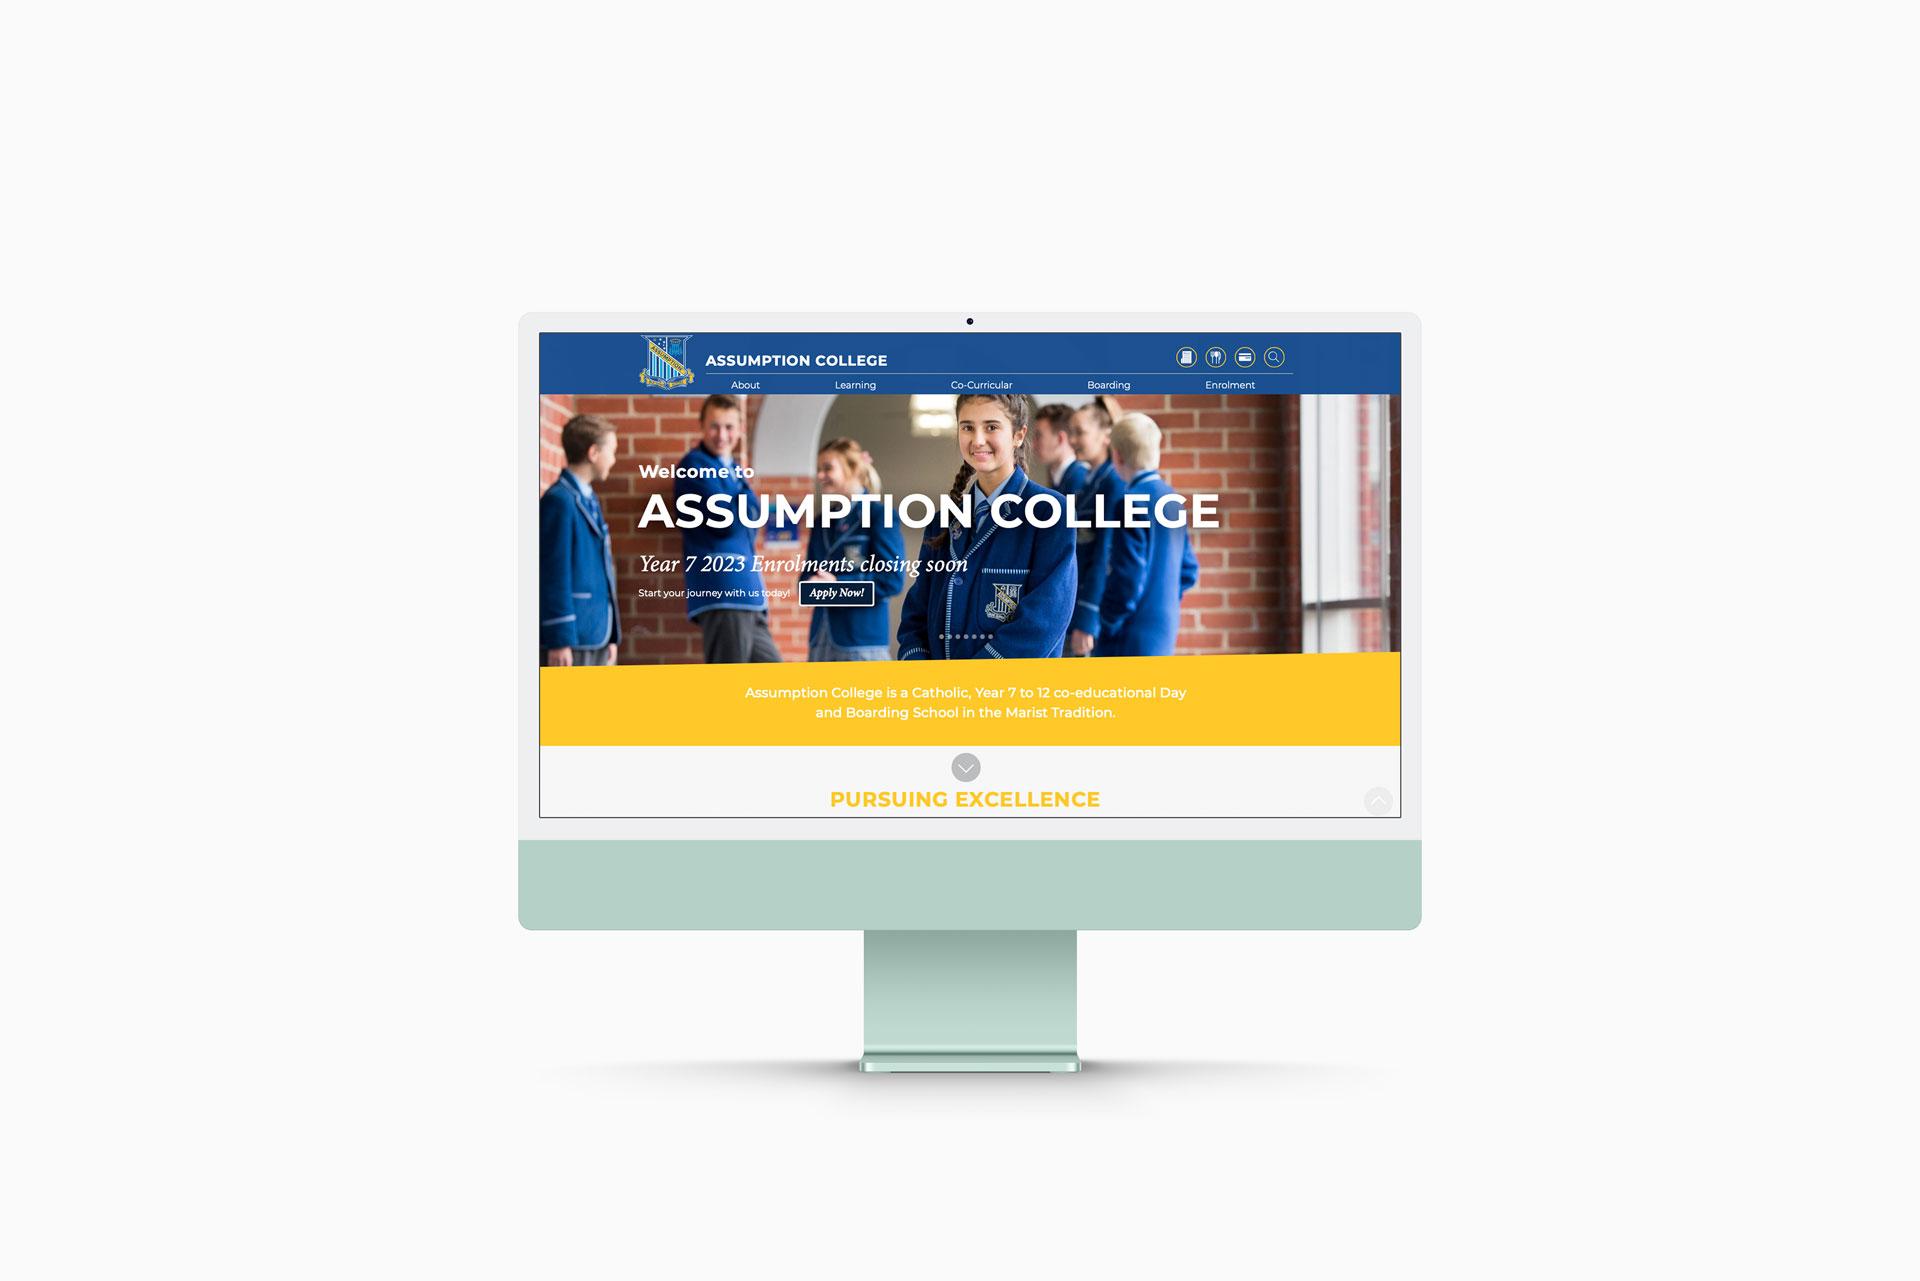 Assumption College Website and Digital